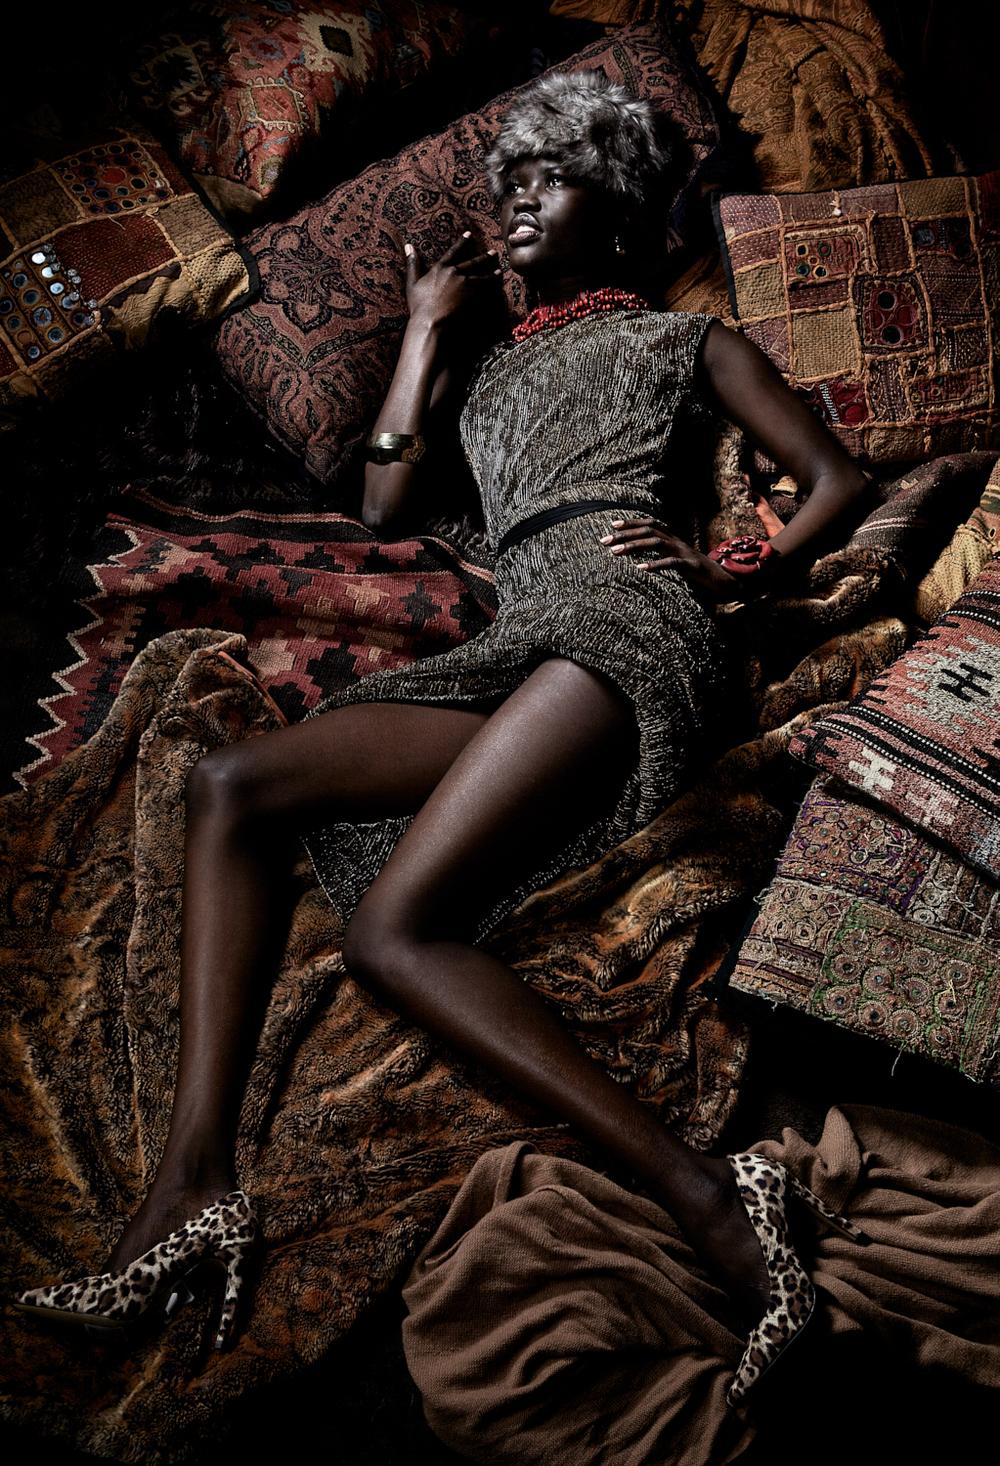 Faux Fur Fashion photographer matthew chen 1.jpg